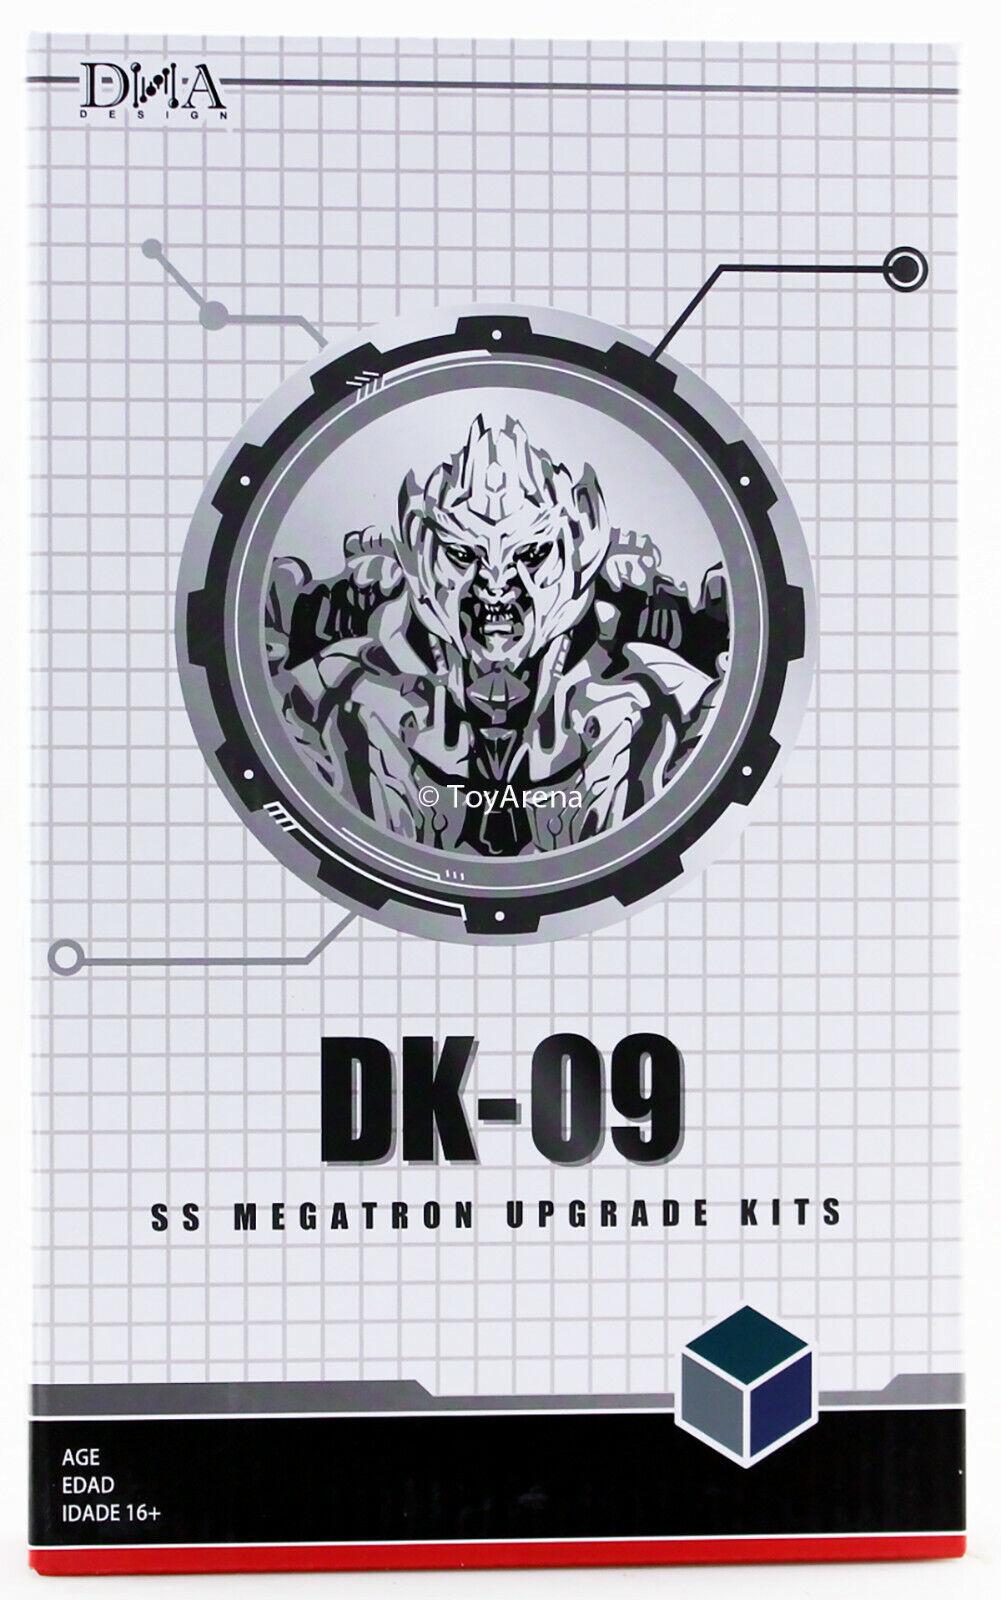 DNA Designs DK-09 Upgrade Kit for Studio Series Voyager Megatron Bonus Add On US